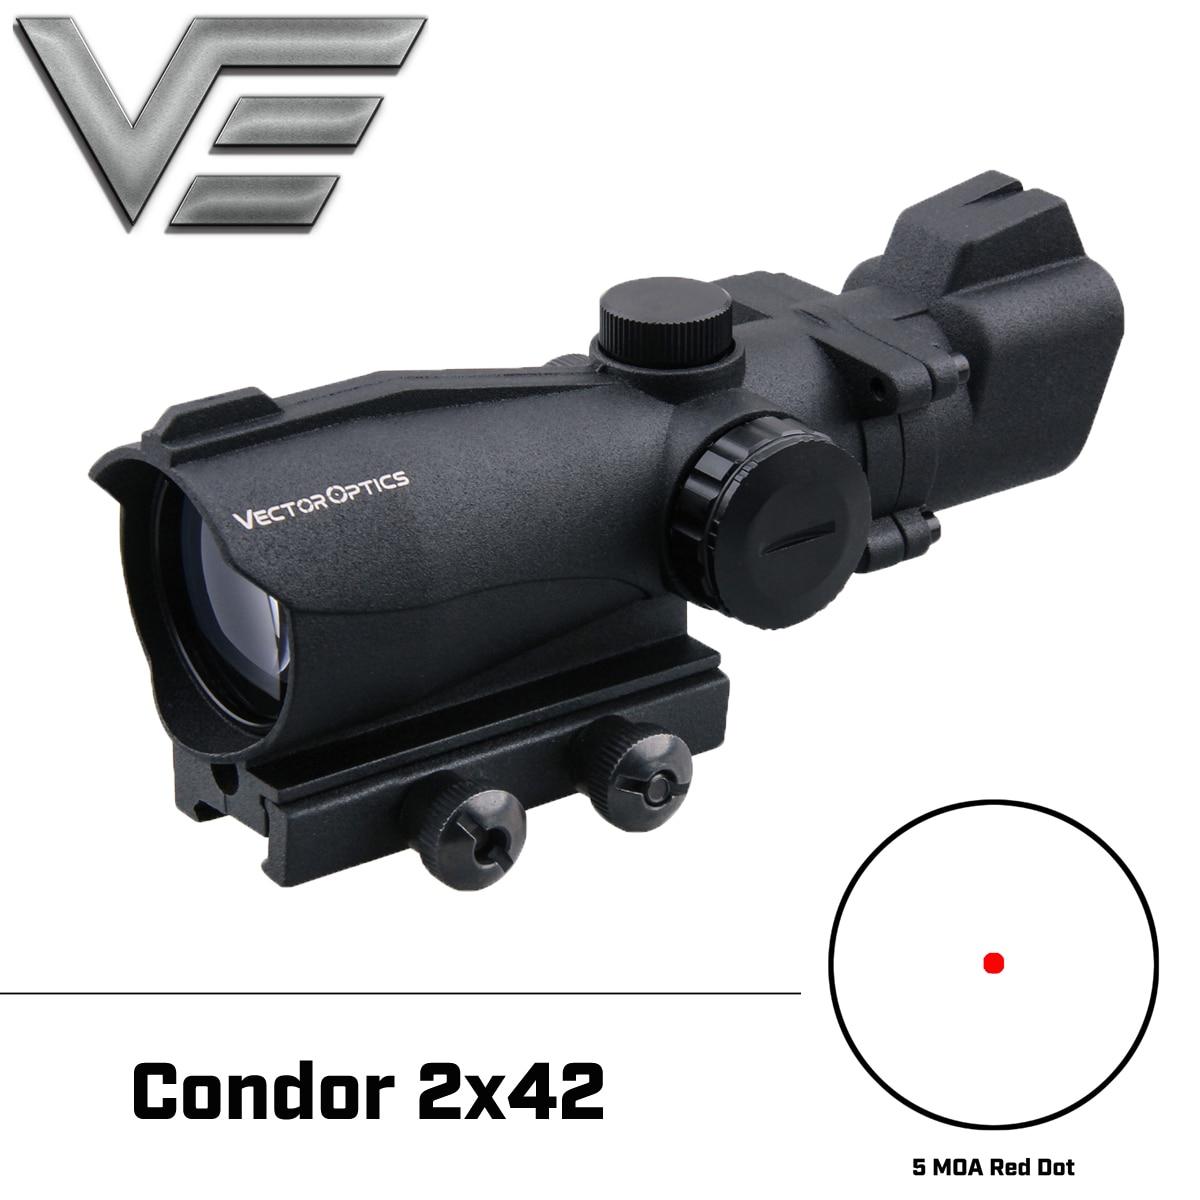 Vector Optics Condor 2x42 Green & Red Dot Shooting Hunting Reflex Rifle Scope 2 Times Magnification Weapon Air Gun Shotgun Sight